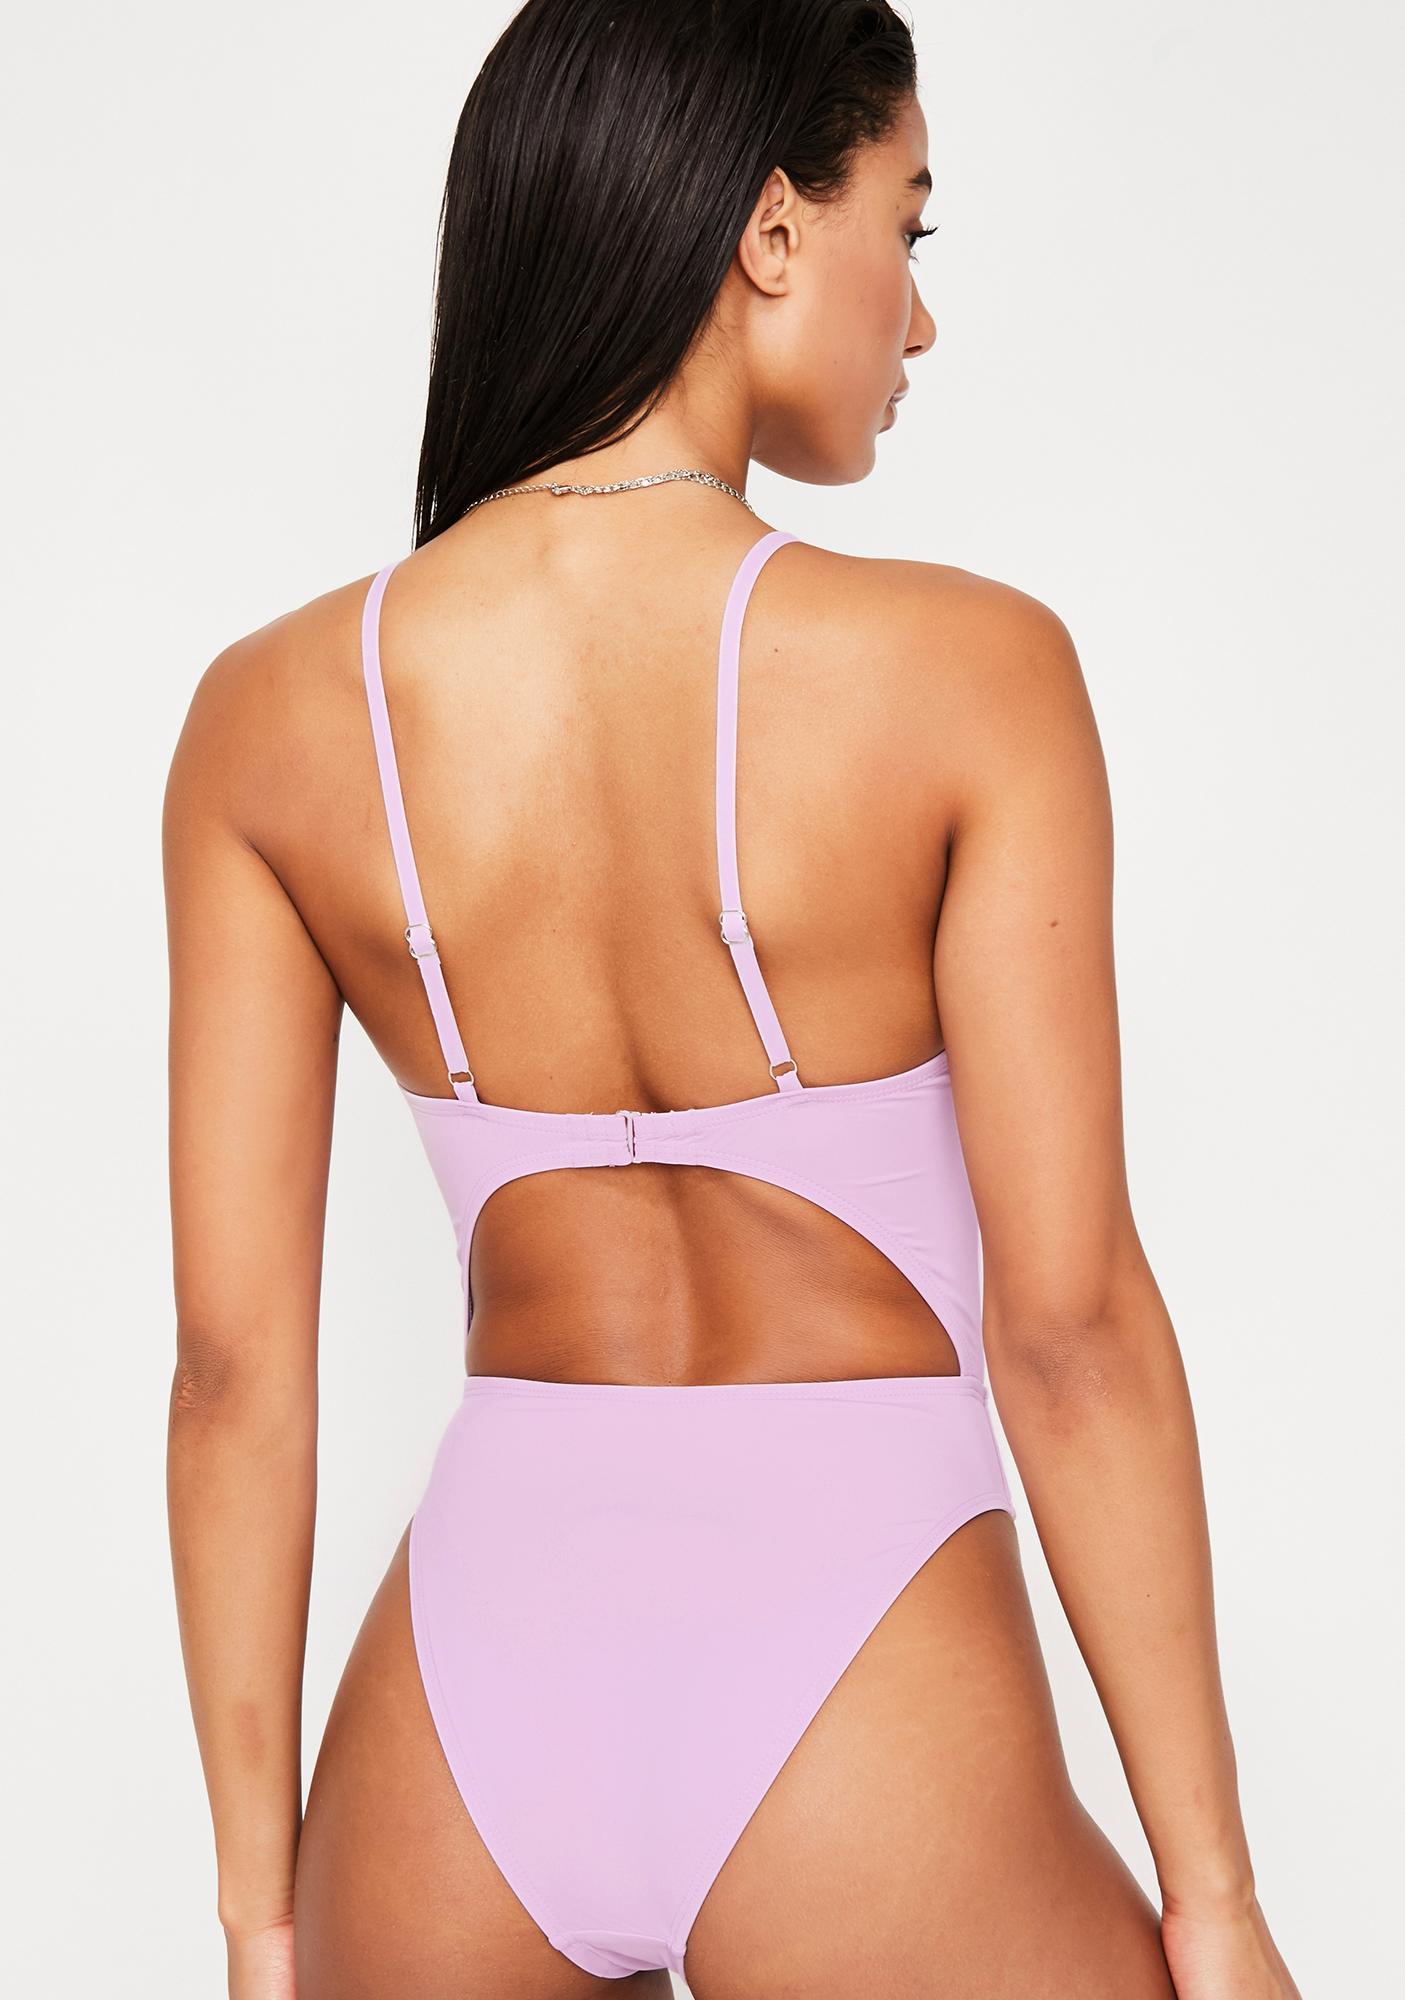 Dippin' Daisy's Lilac Tie Front Cheeky One Piece Bikini